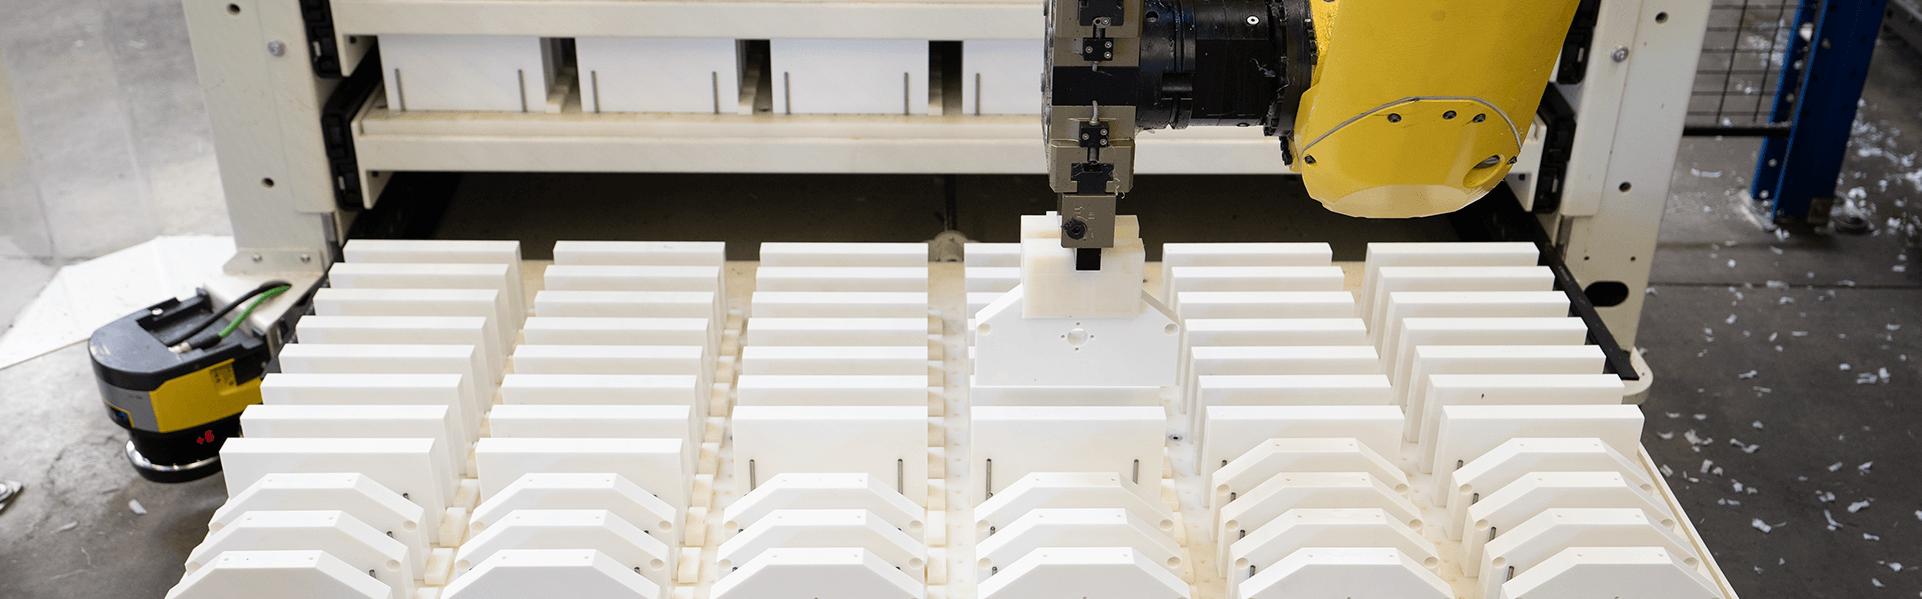 Cellro automatisering met hardware